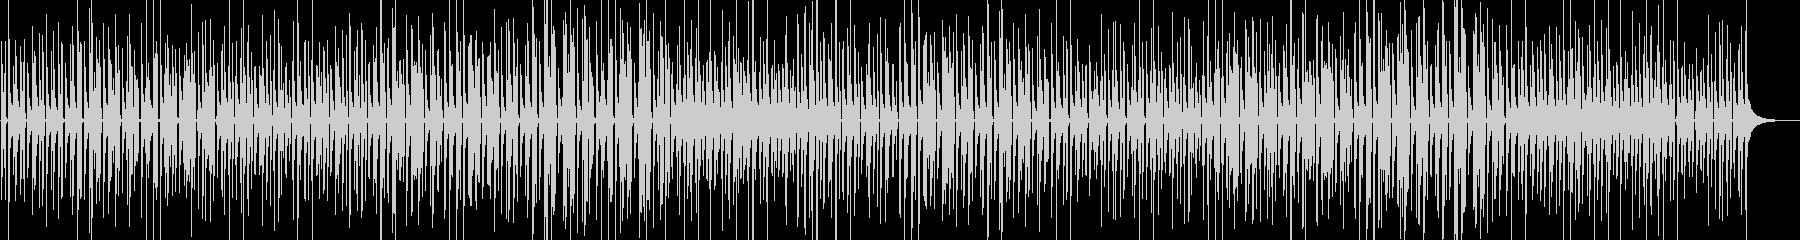 YouTube ウクレレ・口笛・日常の未再生の波形